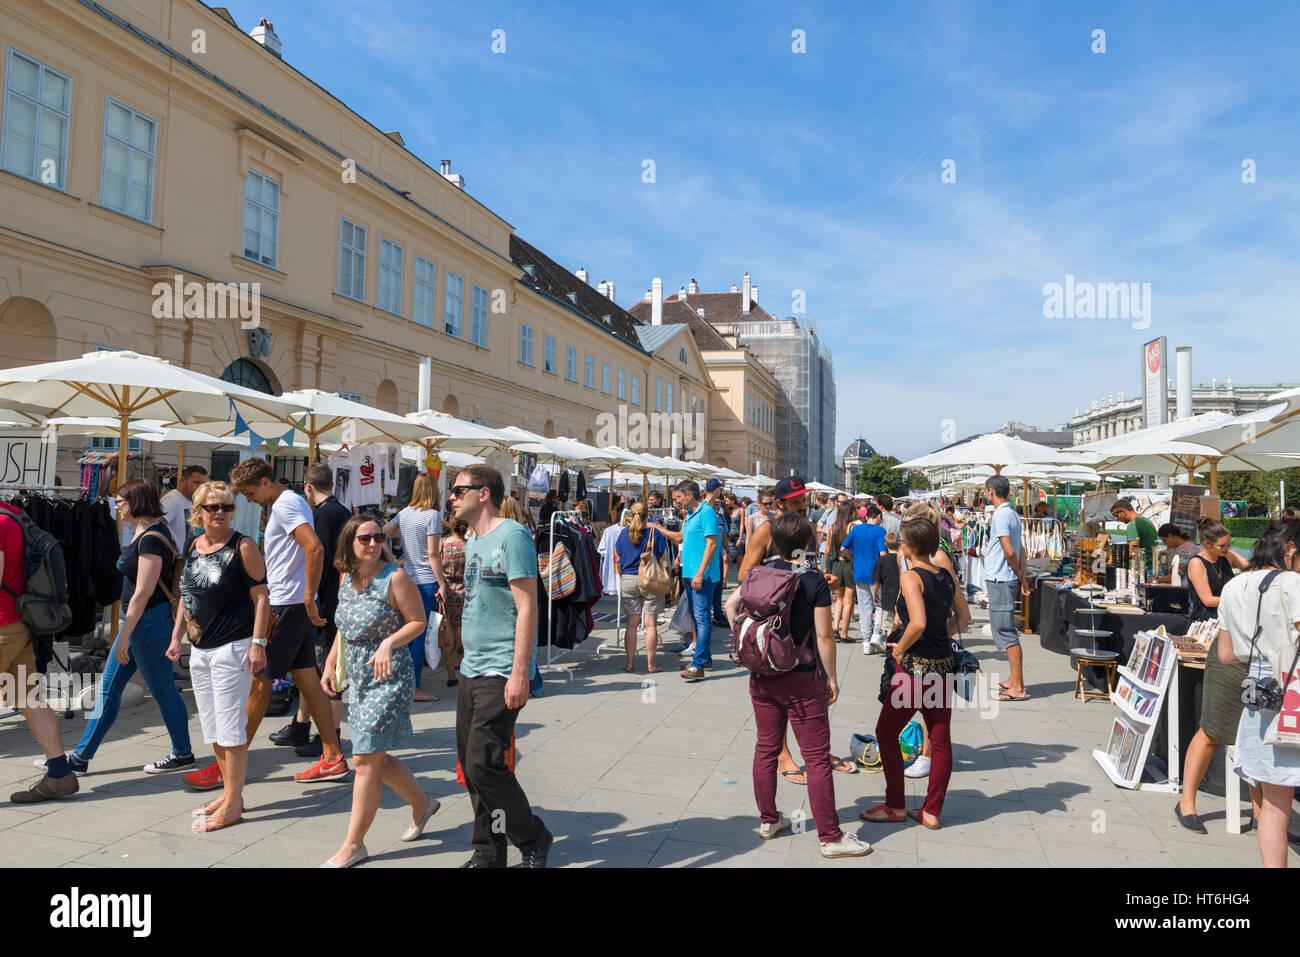 Museum Quarter, Vienna. Market stalls in the MuseumsQuartier, Vienna, Austria - Stock Image